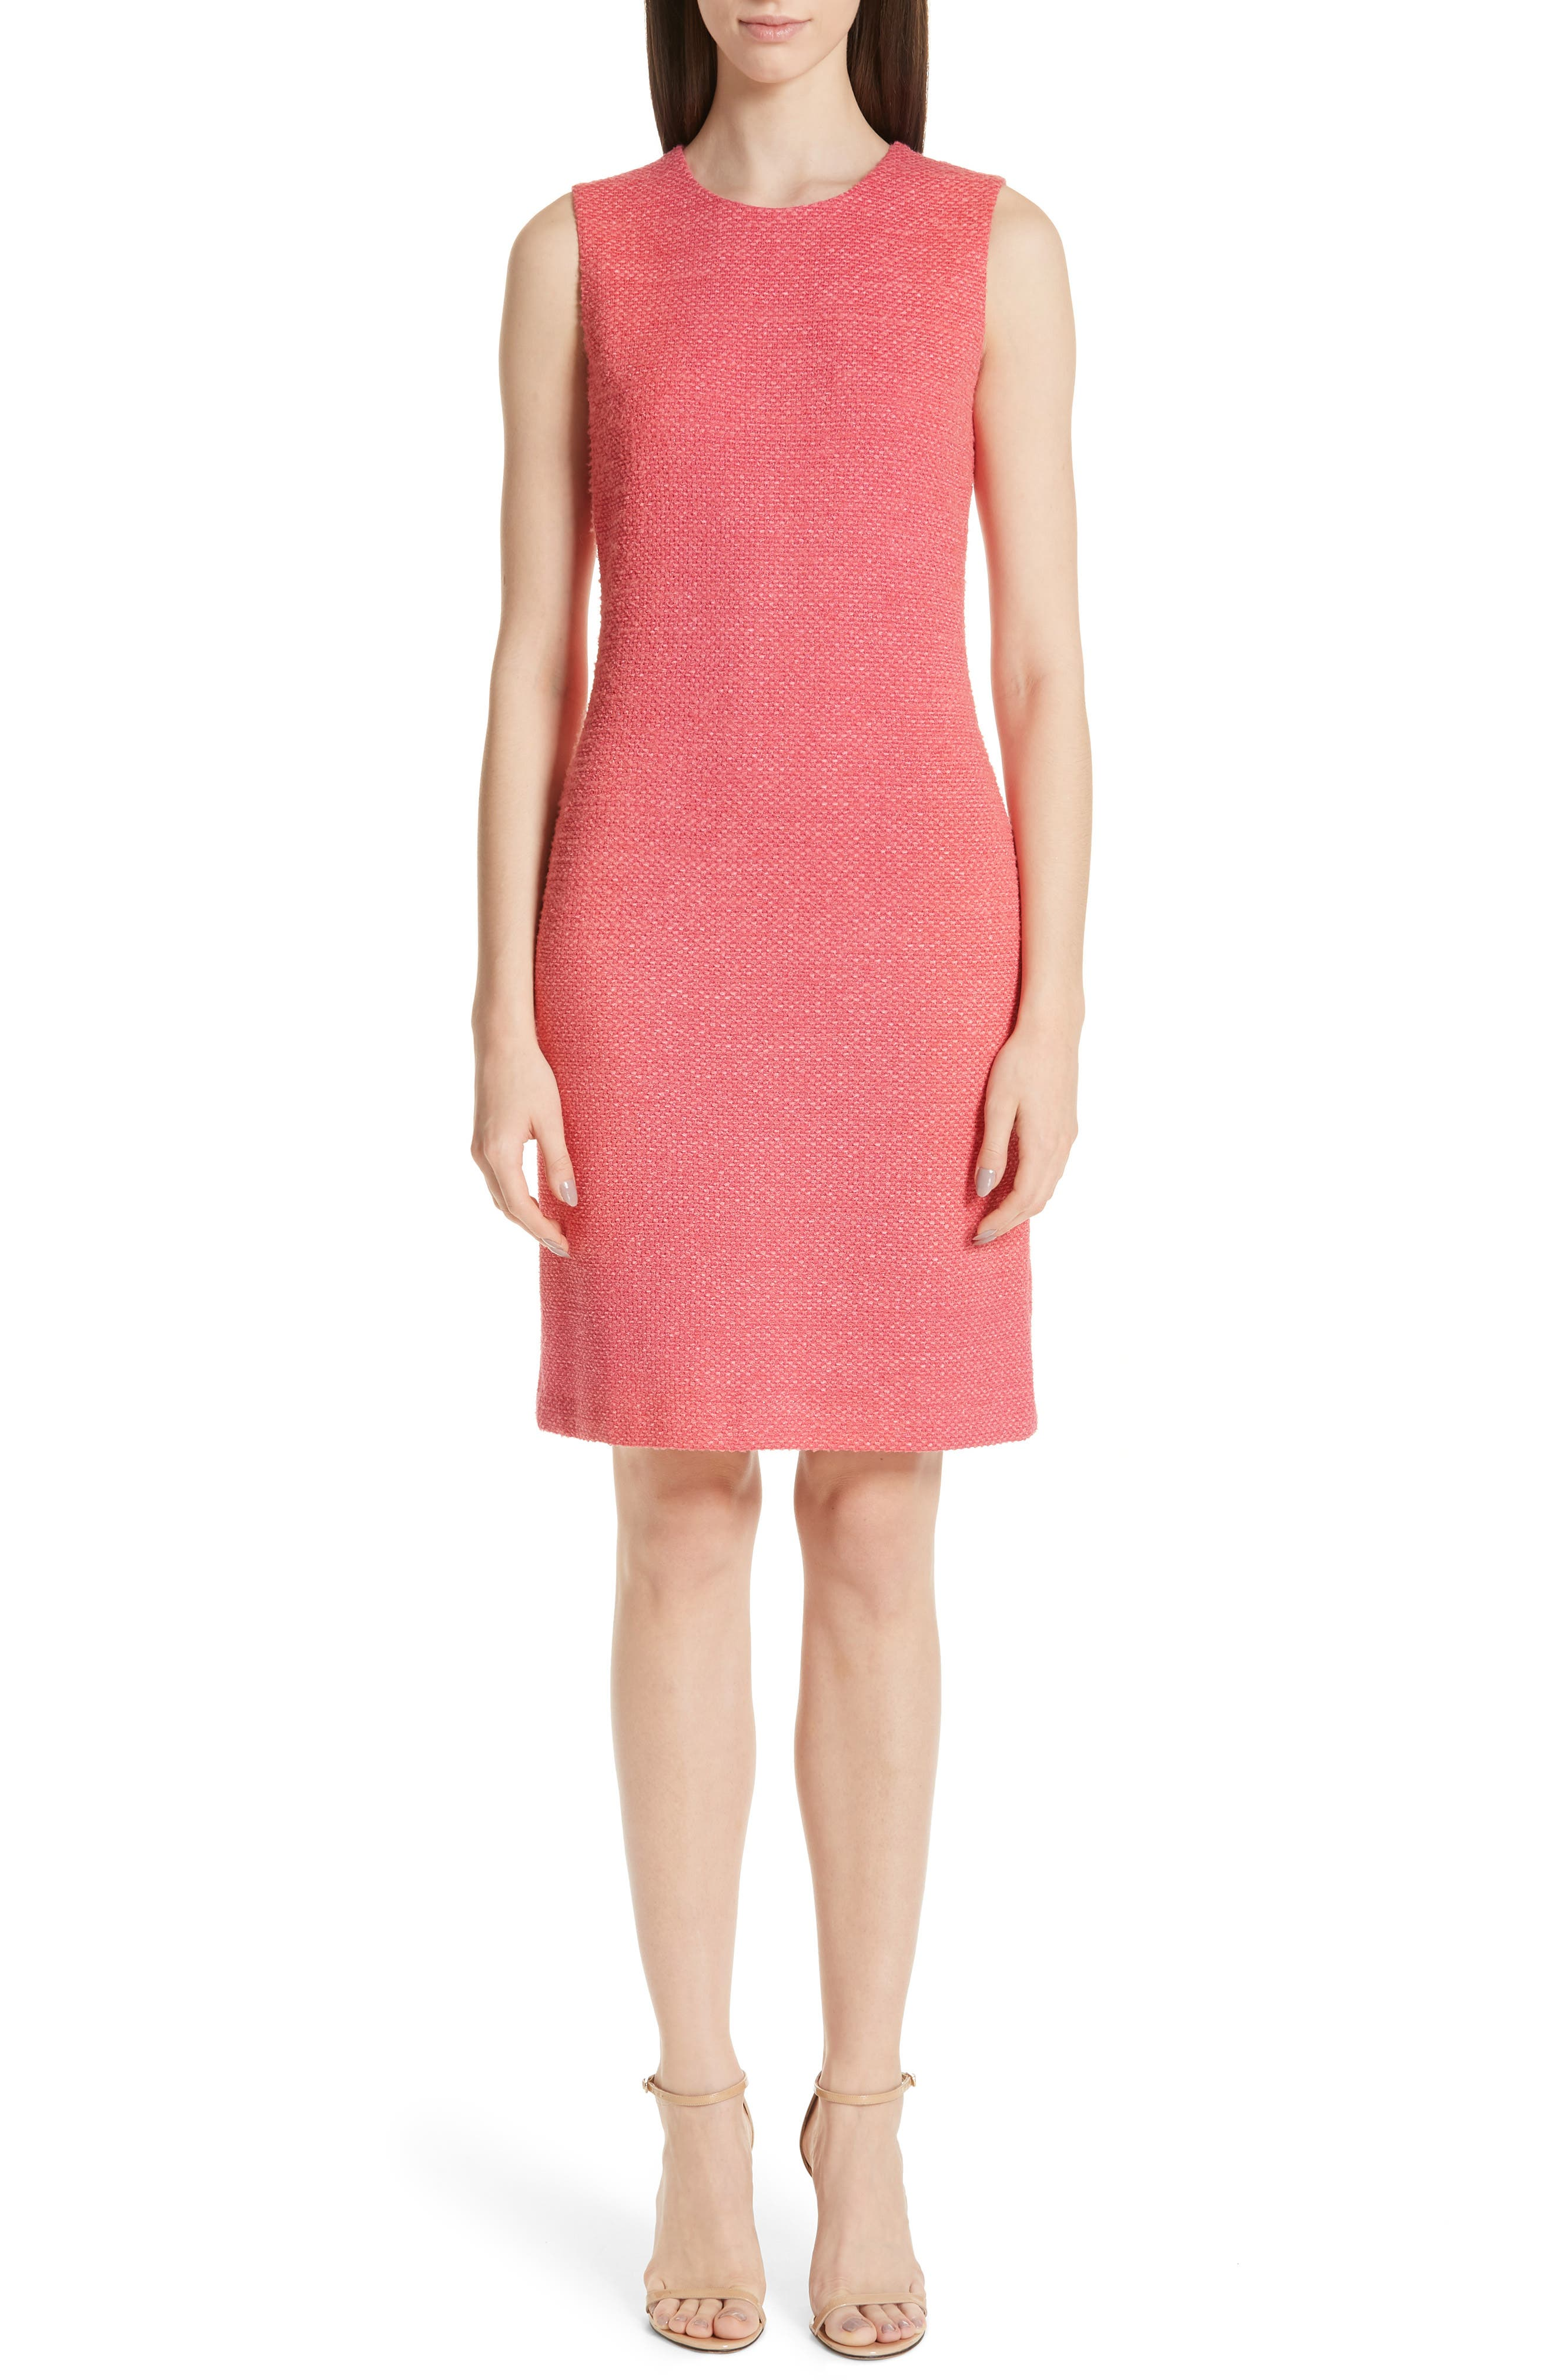 St. John Collection Beti Knit Dress, Coral